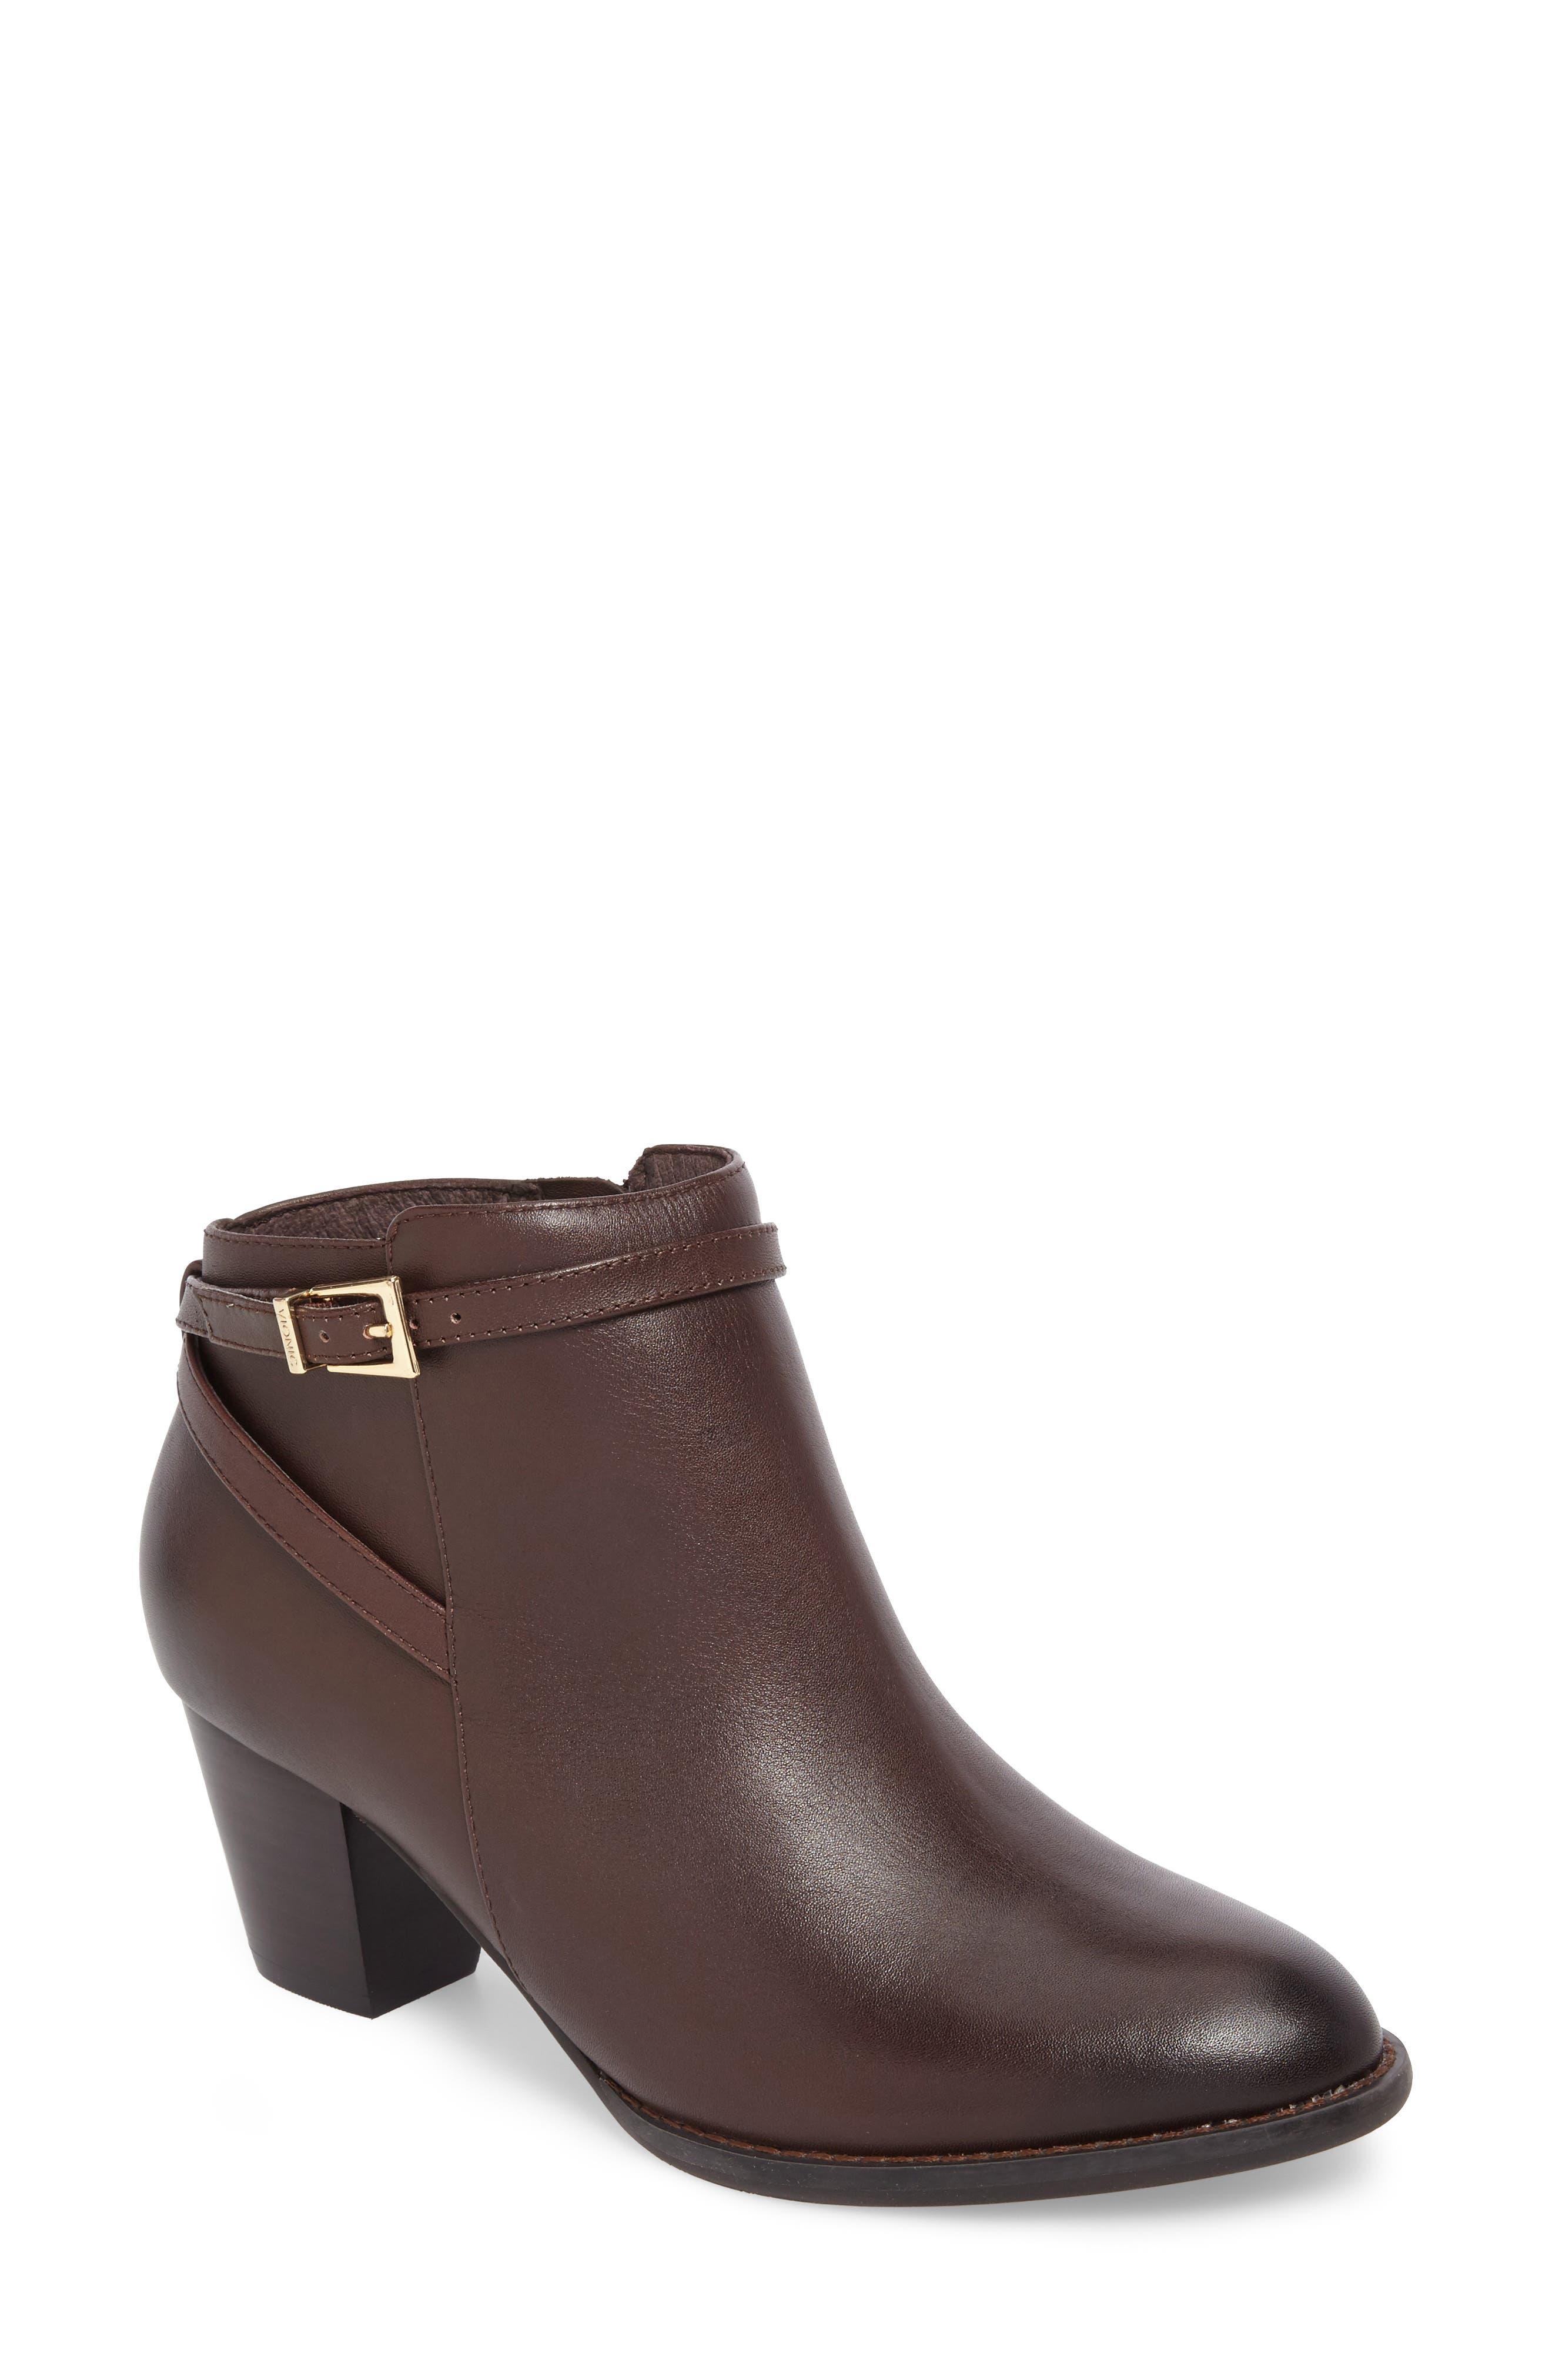 'Upton' Block Heel Boot,                         Main,                         color,